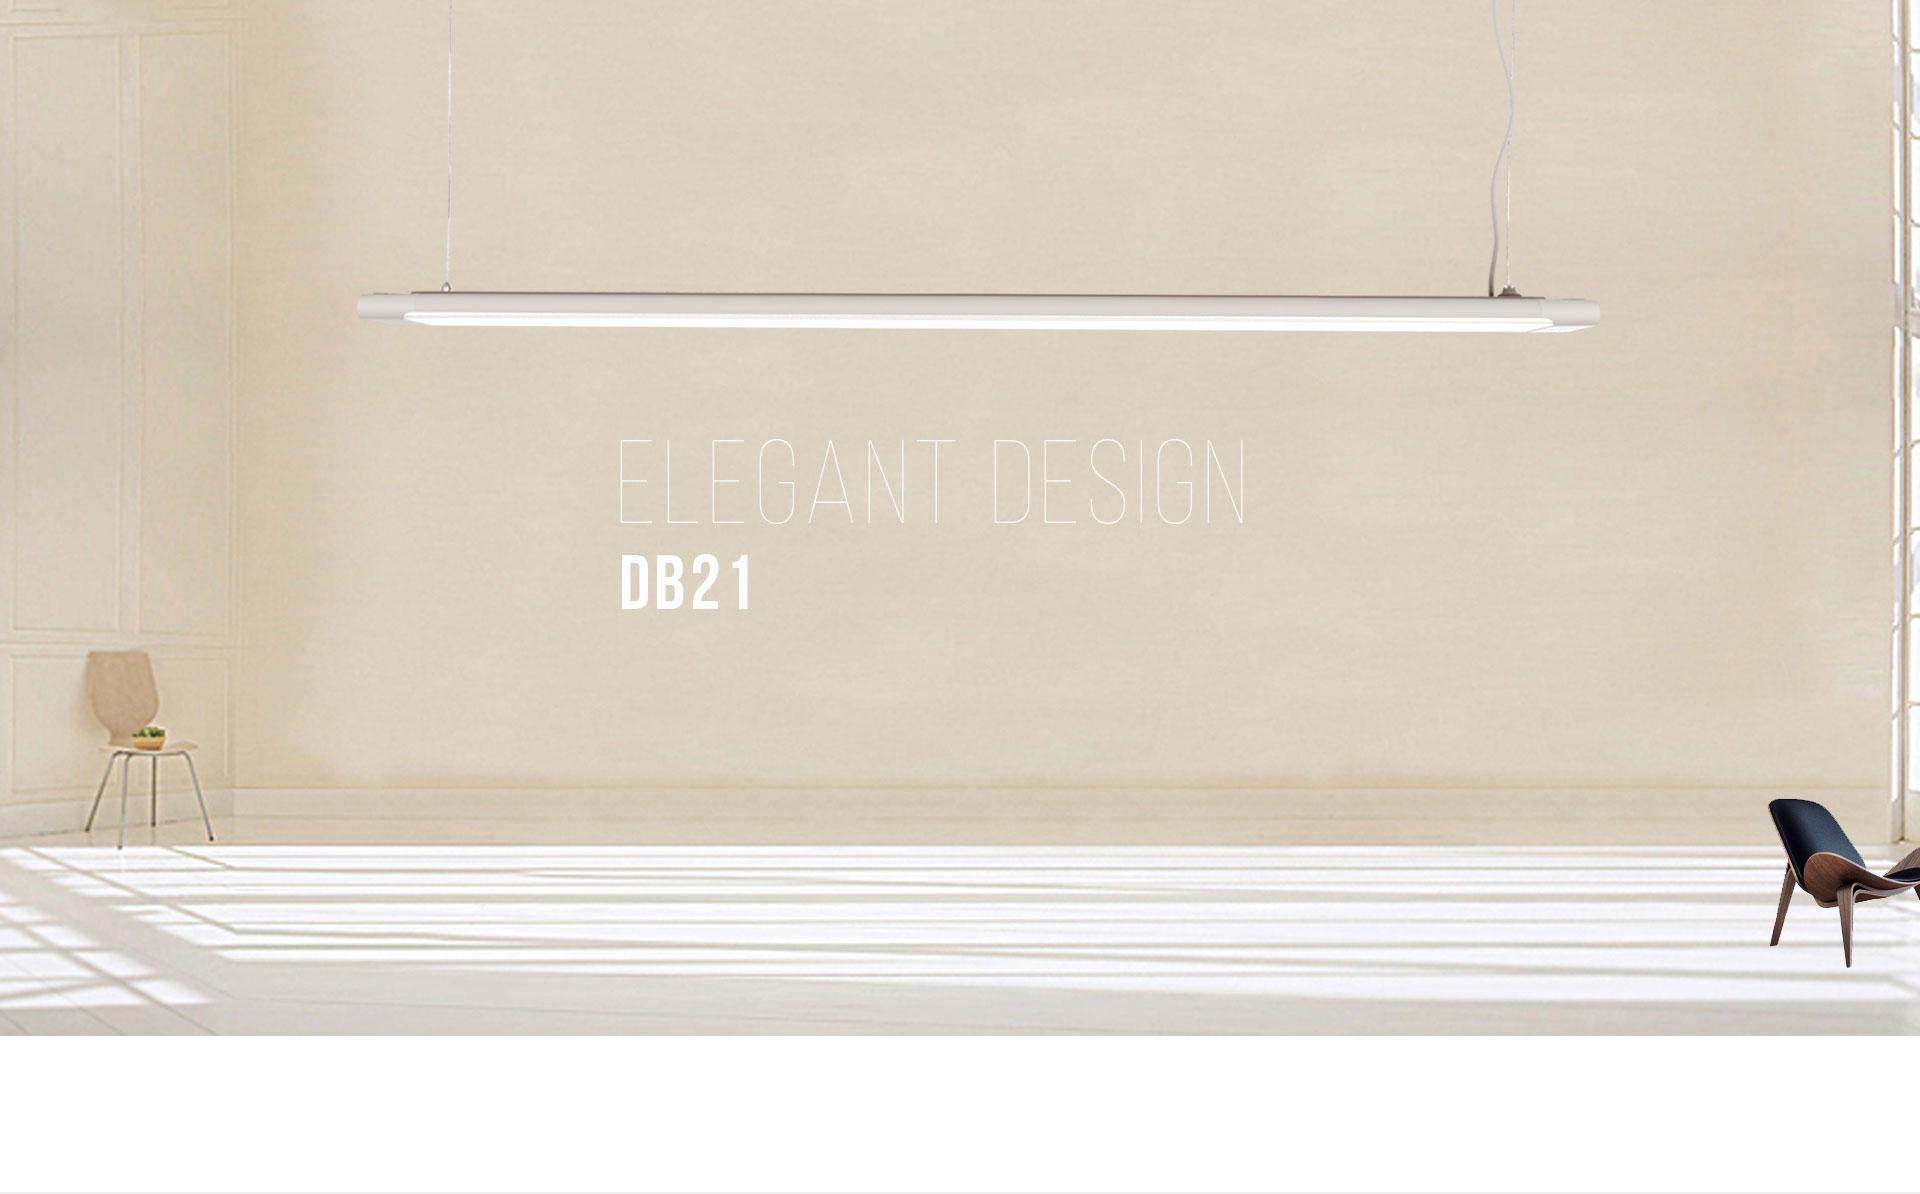 DB21-Stylish-LED-Batten_01